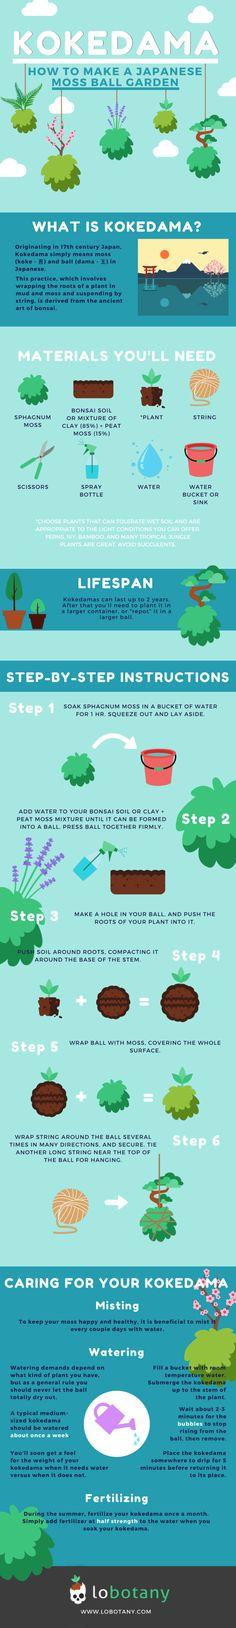 Kokedama: How To Make A Japanese Moss Ball Garden